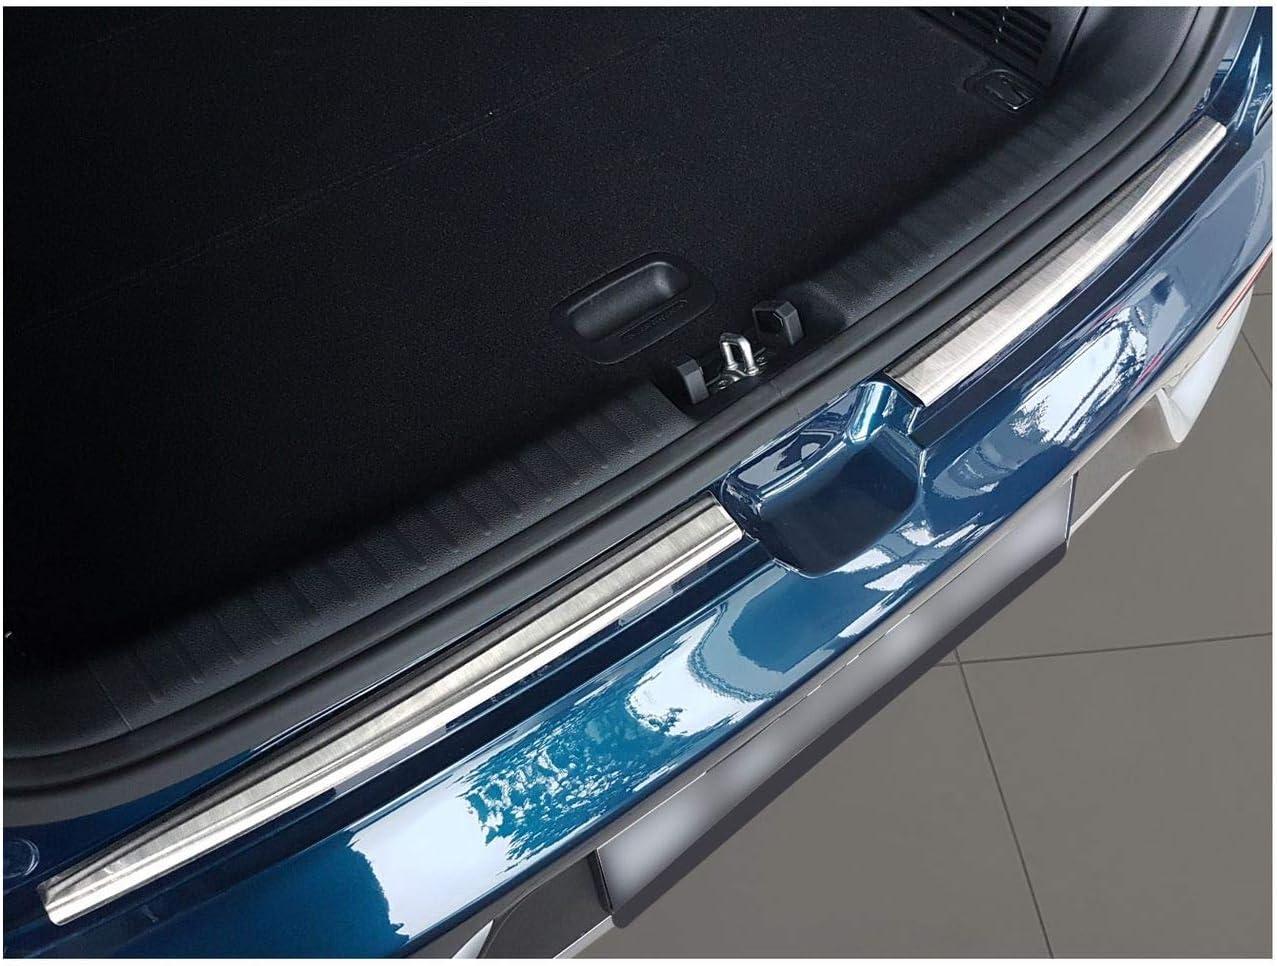 Ladekantenschutz Folie für Kia Niro ab Bj 2016 Lackschutzfolie Selbstklebend